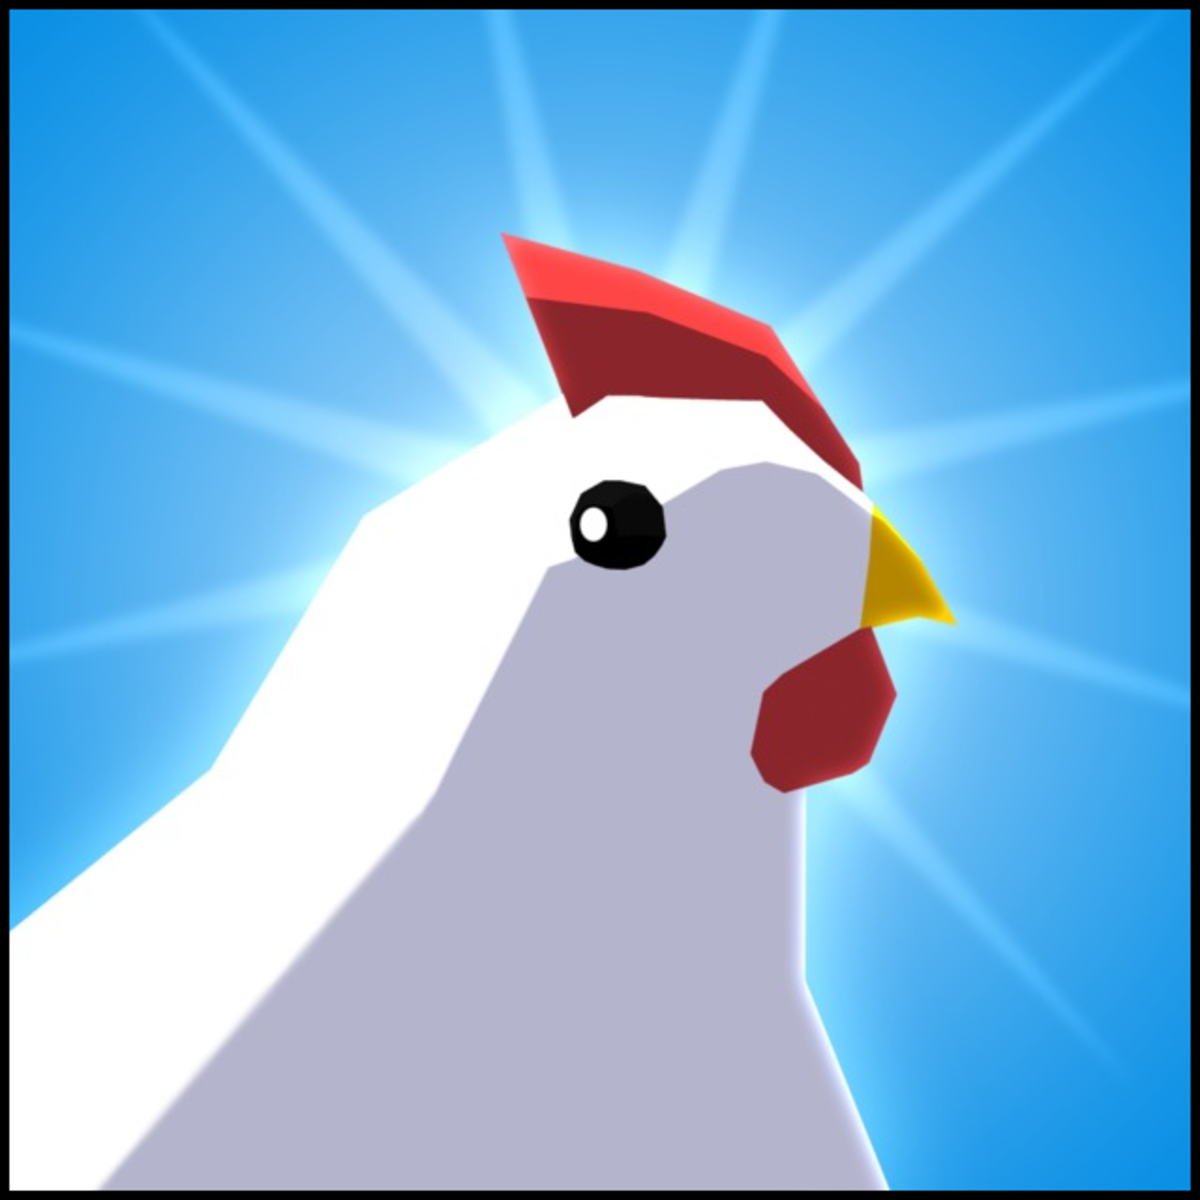 The app's logo.